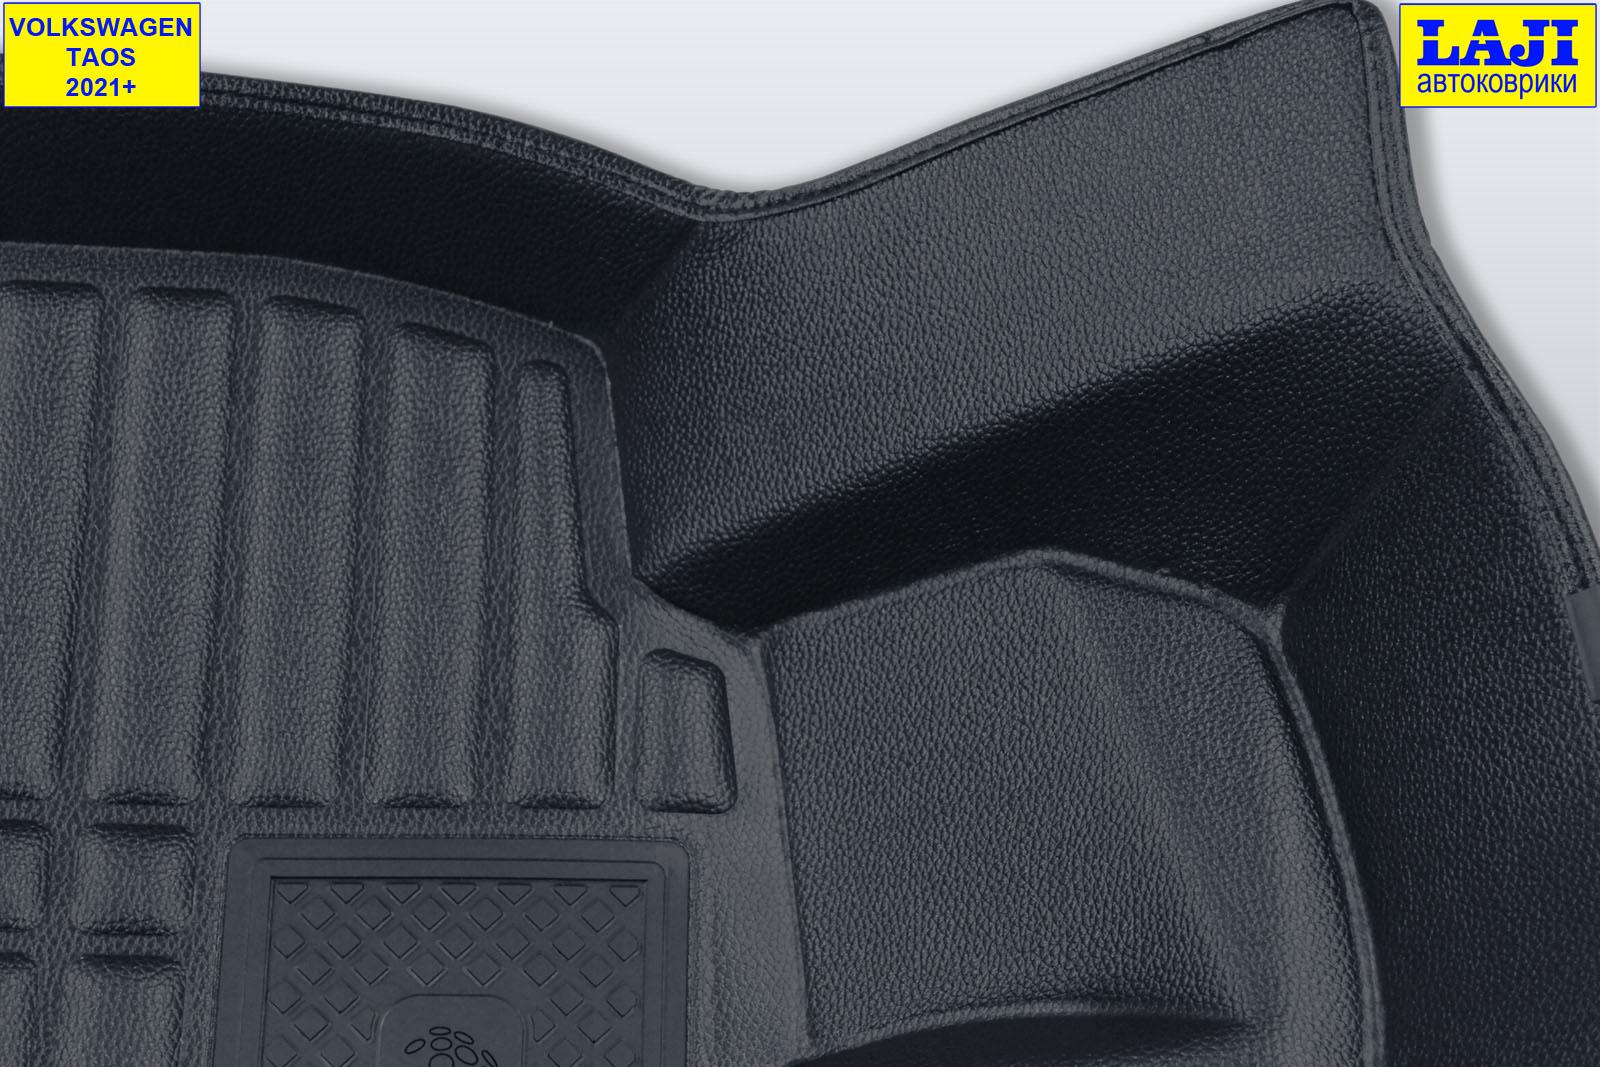 5D коврики в салон Volkswagen Taos 2021-н.в. 6